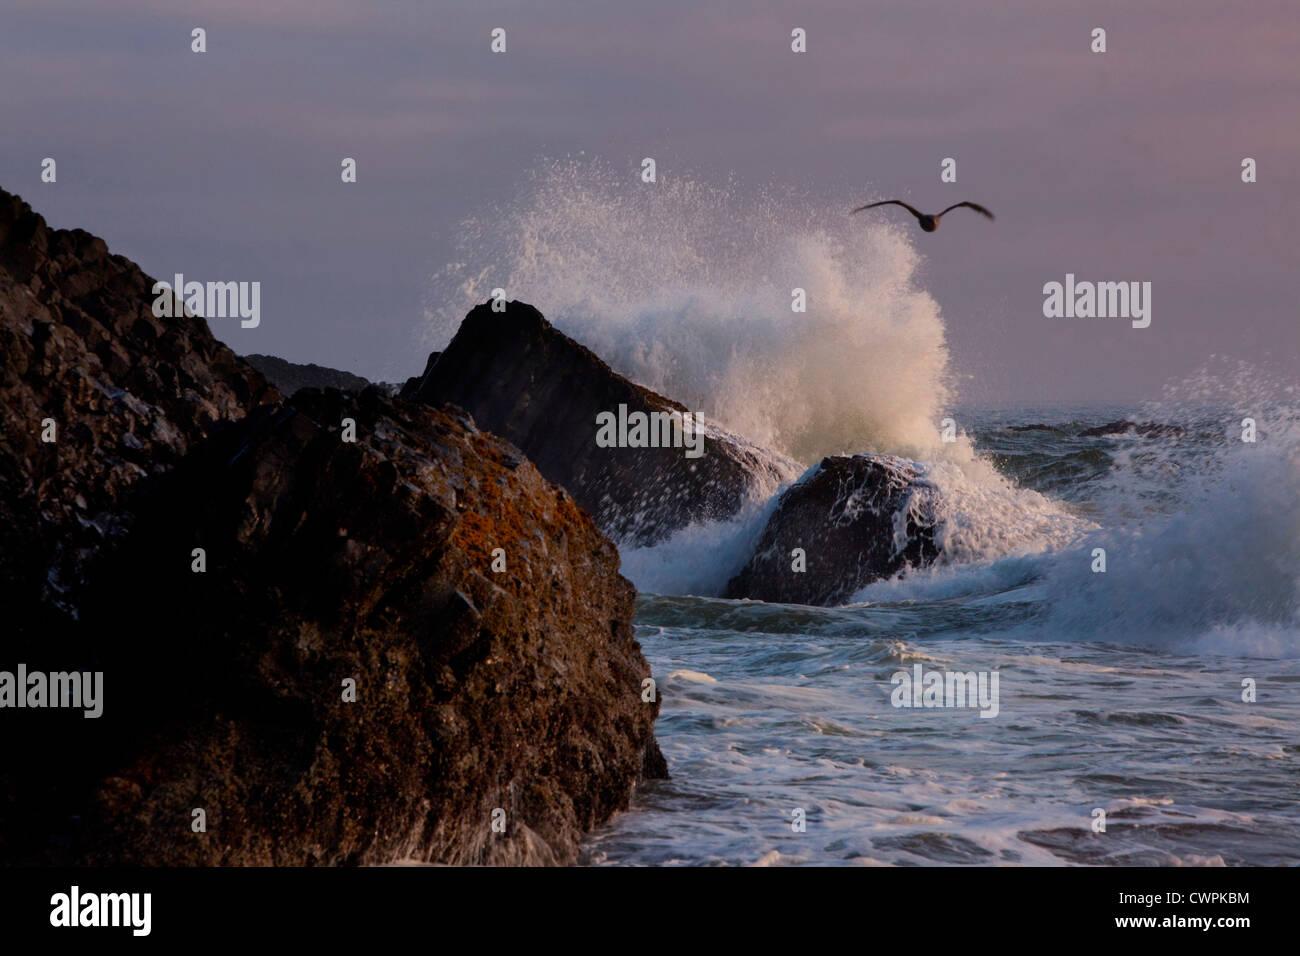 Crashing Waves at Seal Rock Coastline, Oregon, USA - Stock Image